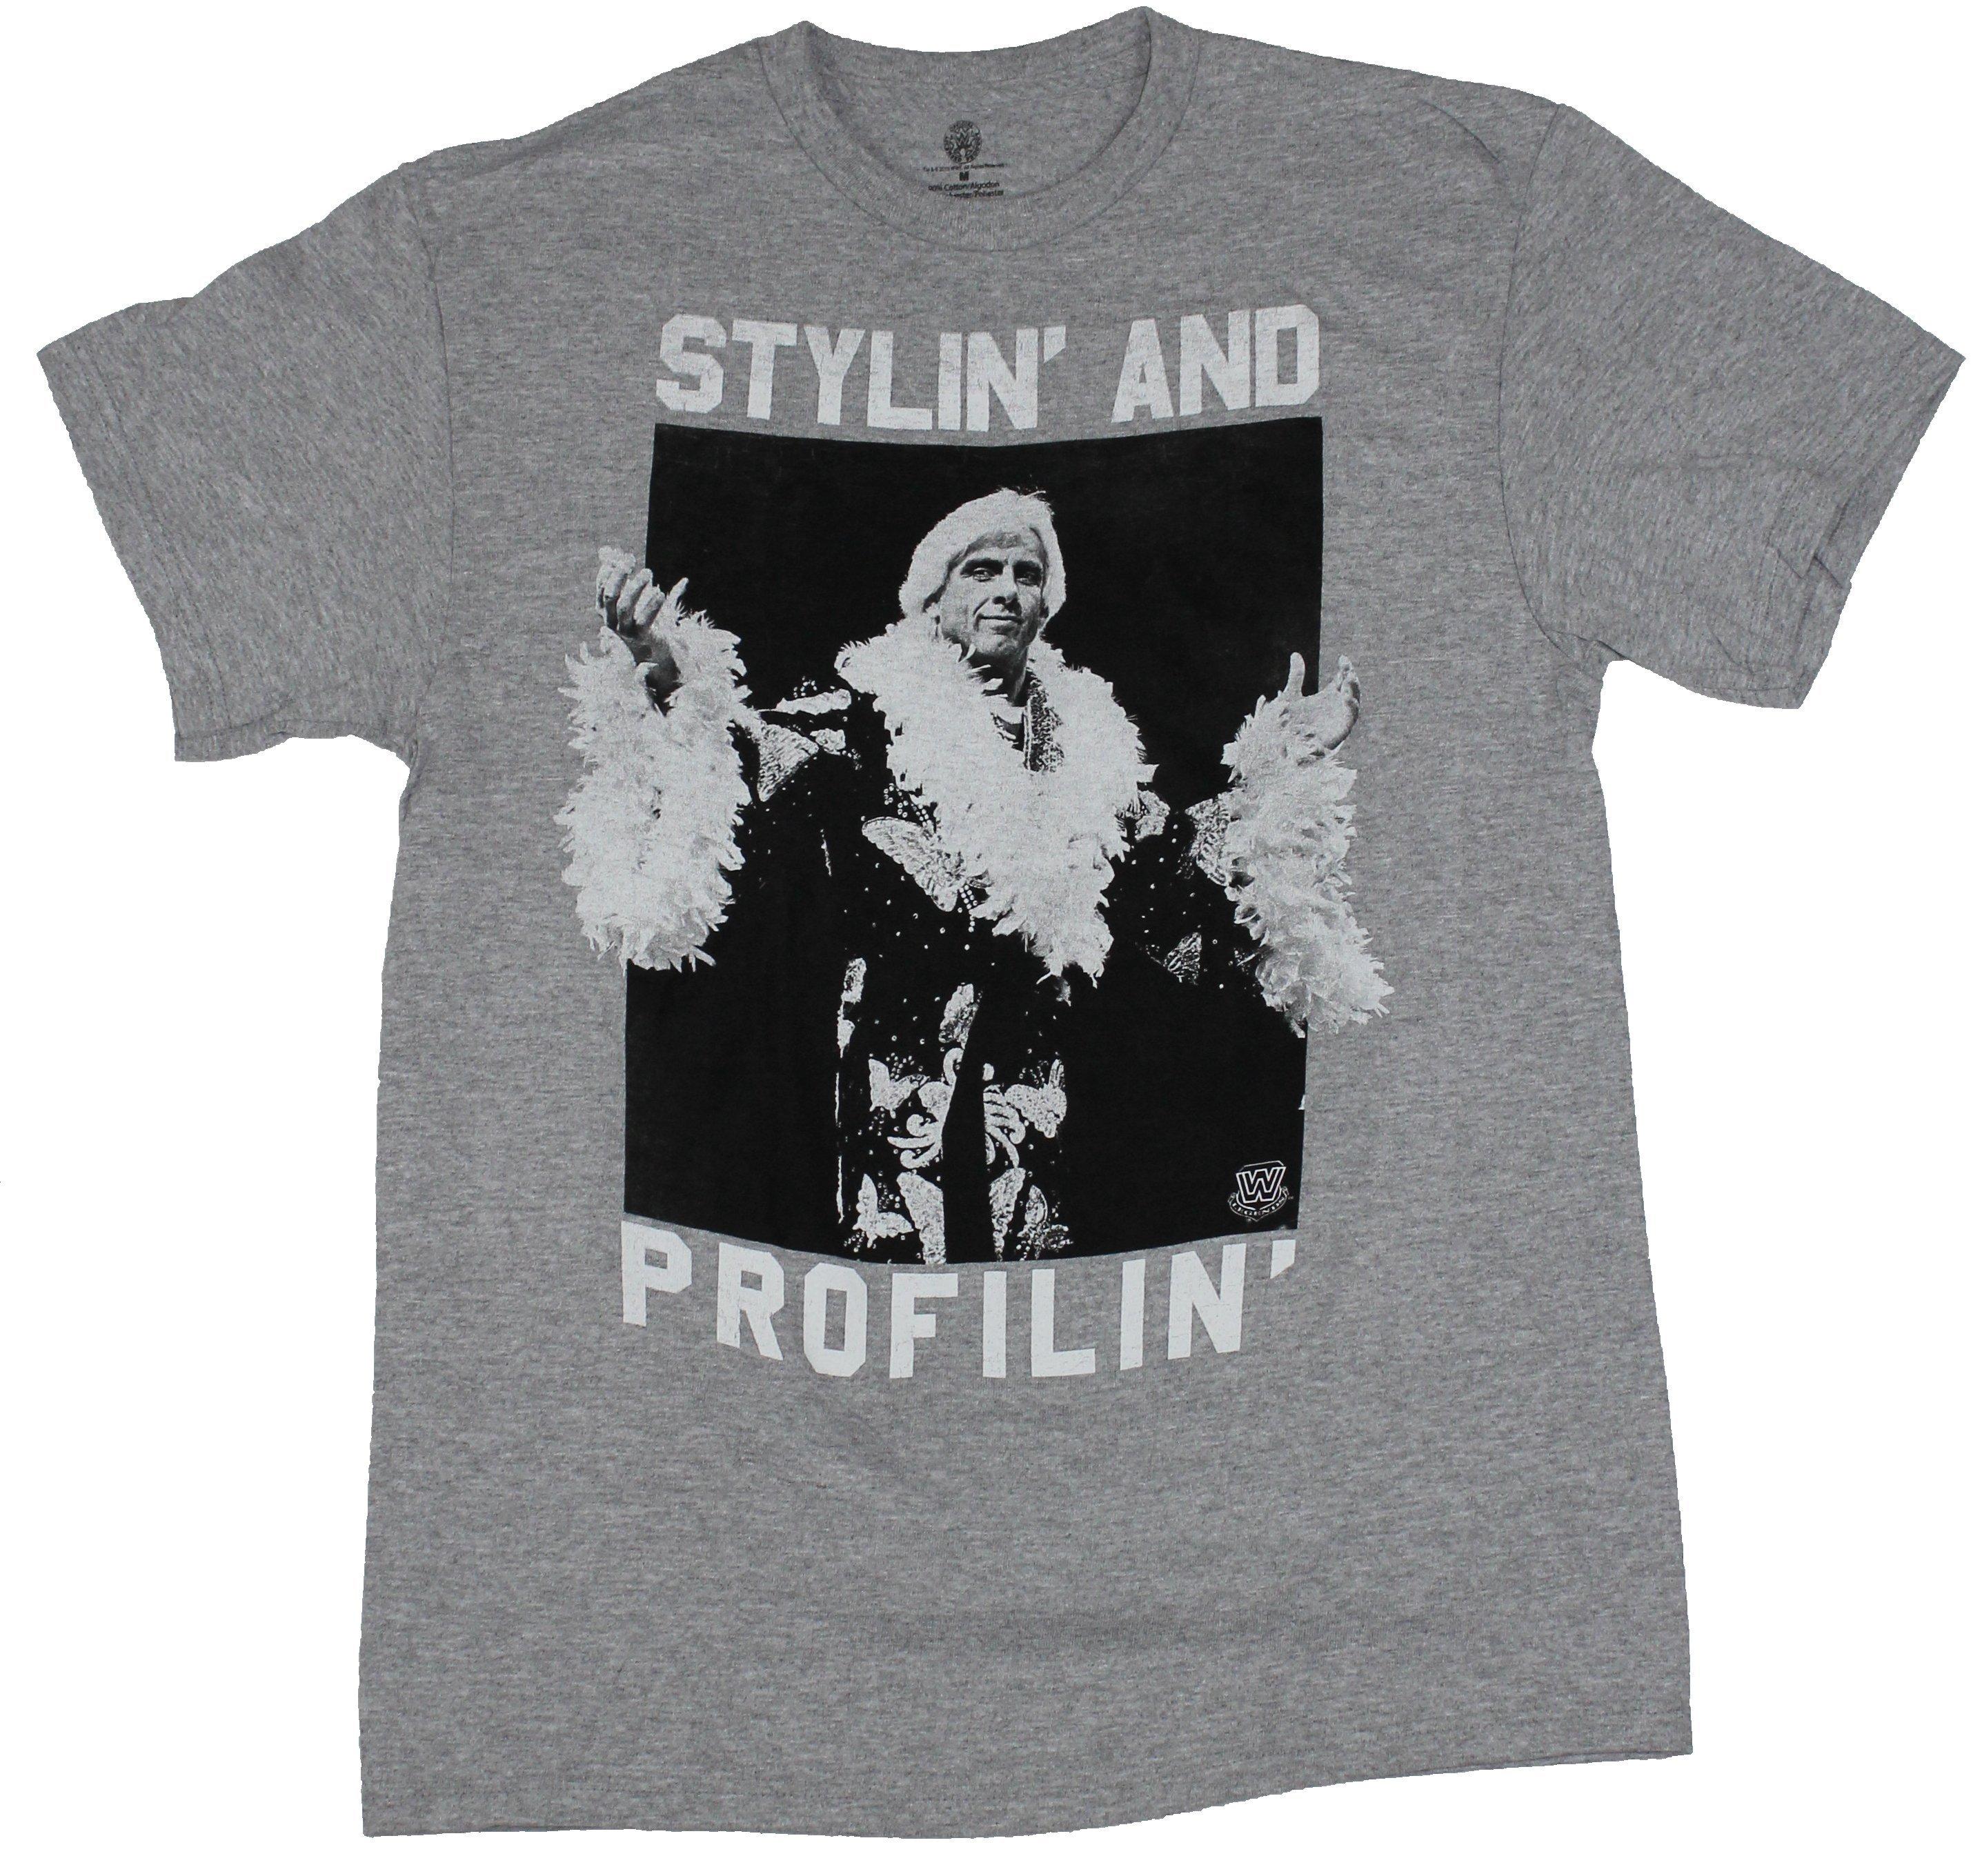 Ric Flair WWE Mens T-Shirt - Stylin & Profiln Photo Image (XXXX-Large)